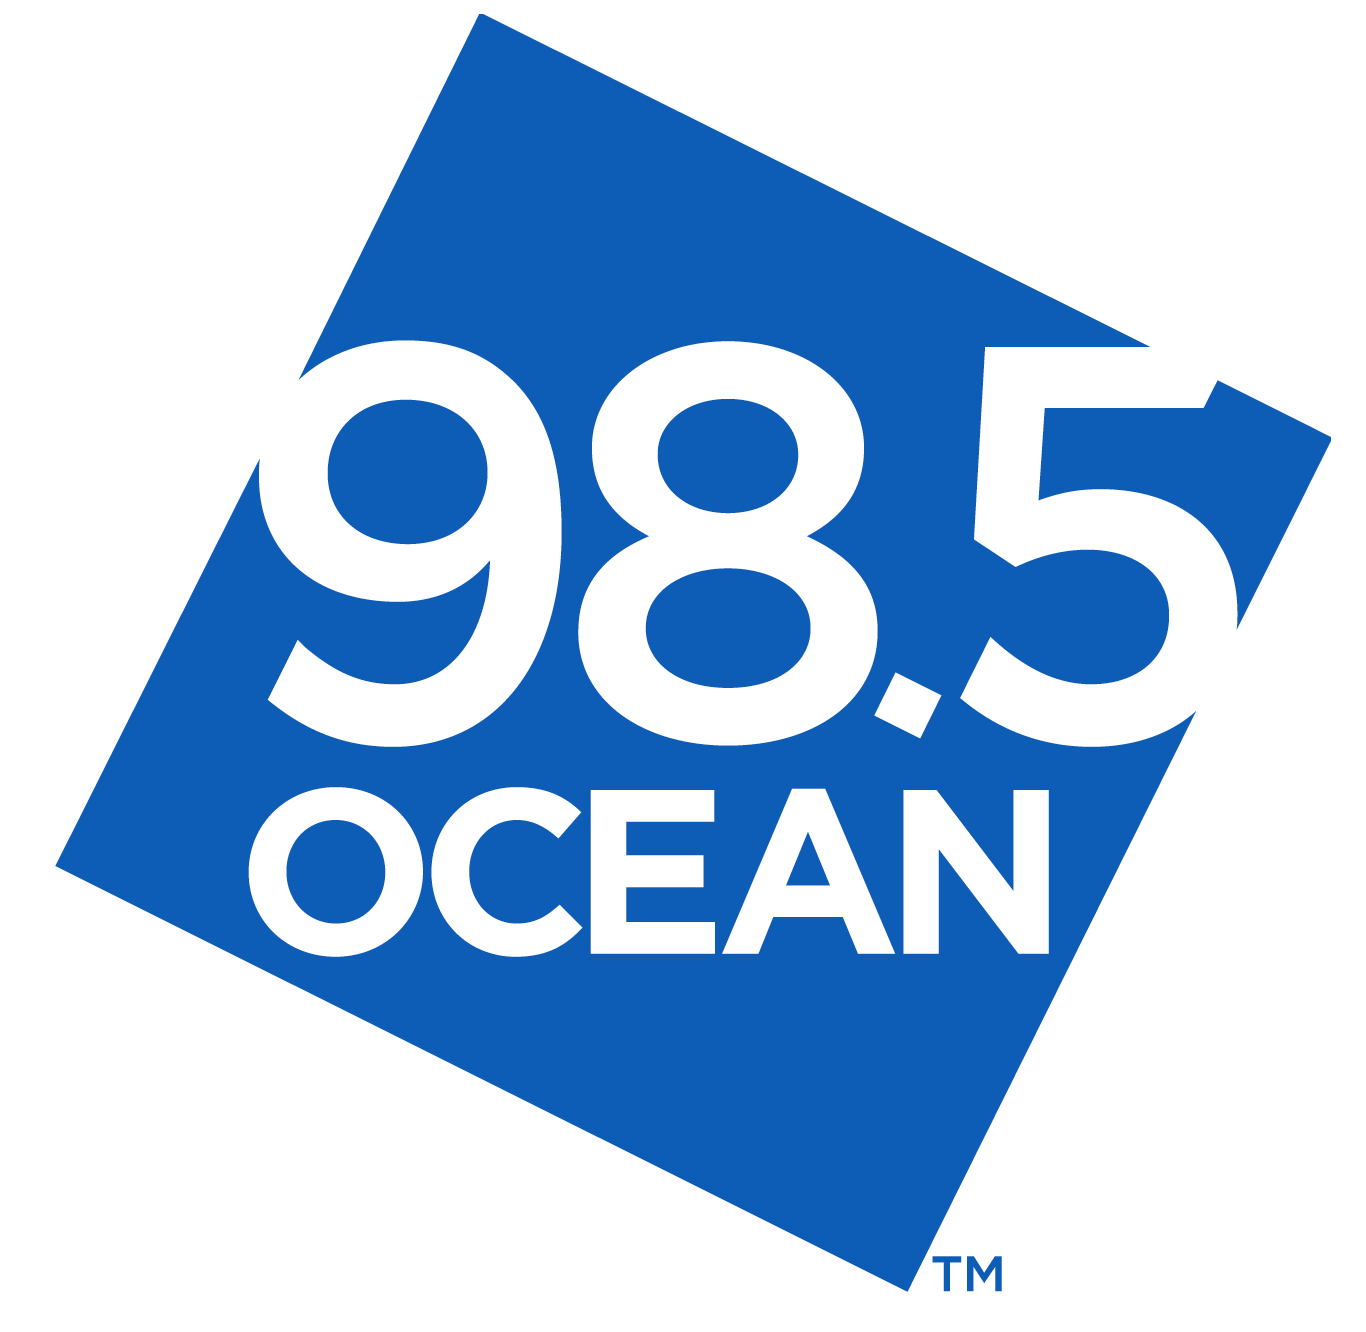 ocean98.5logo